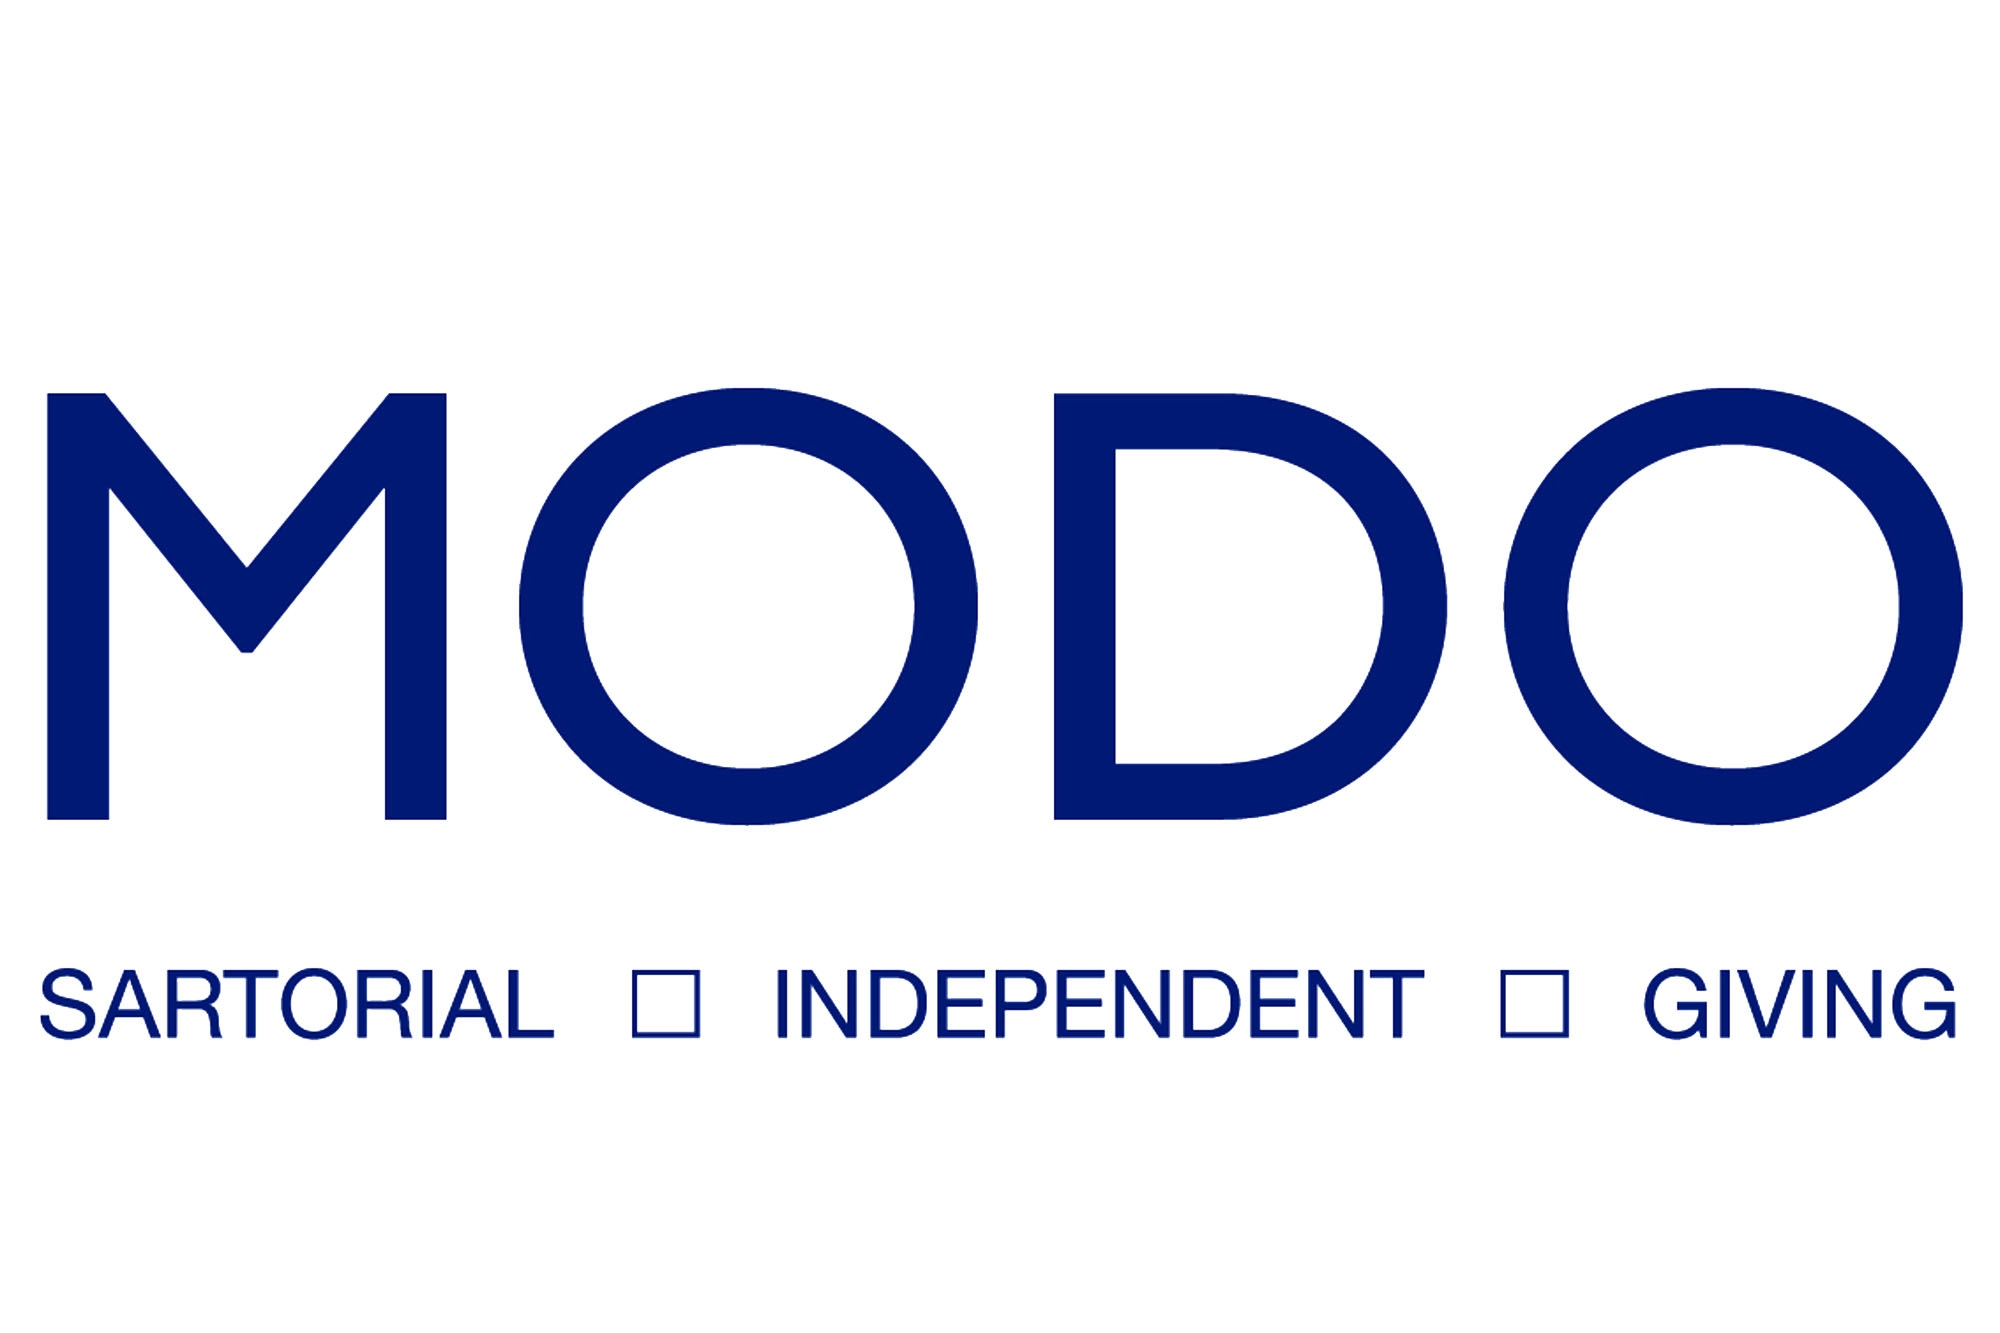 Modo - Modell 4050 RED